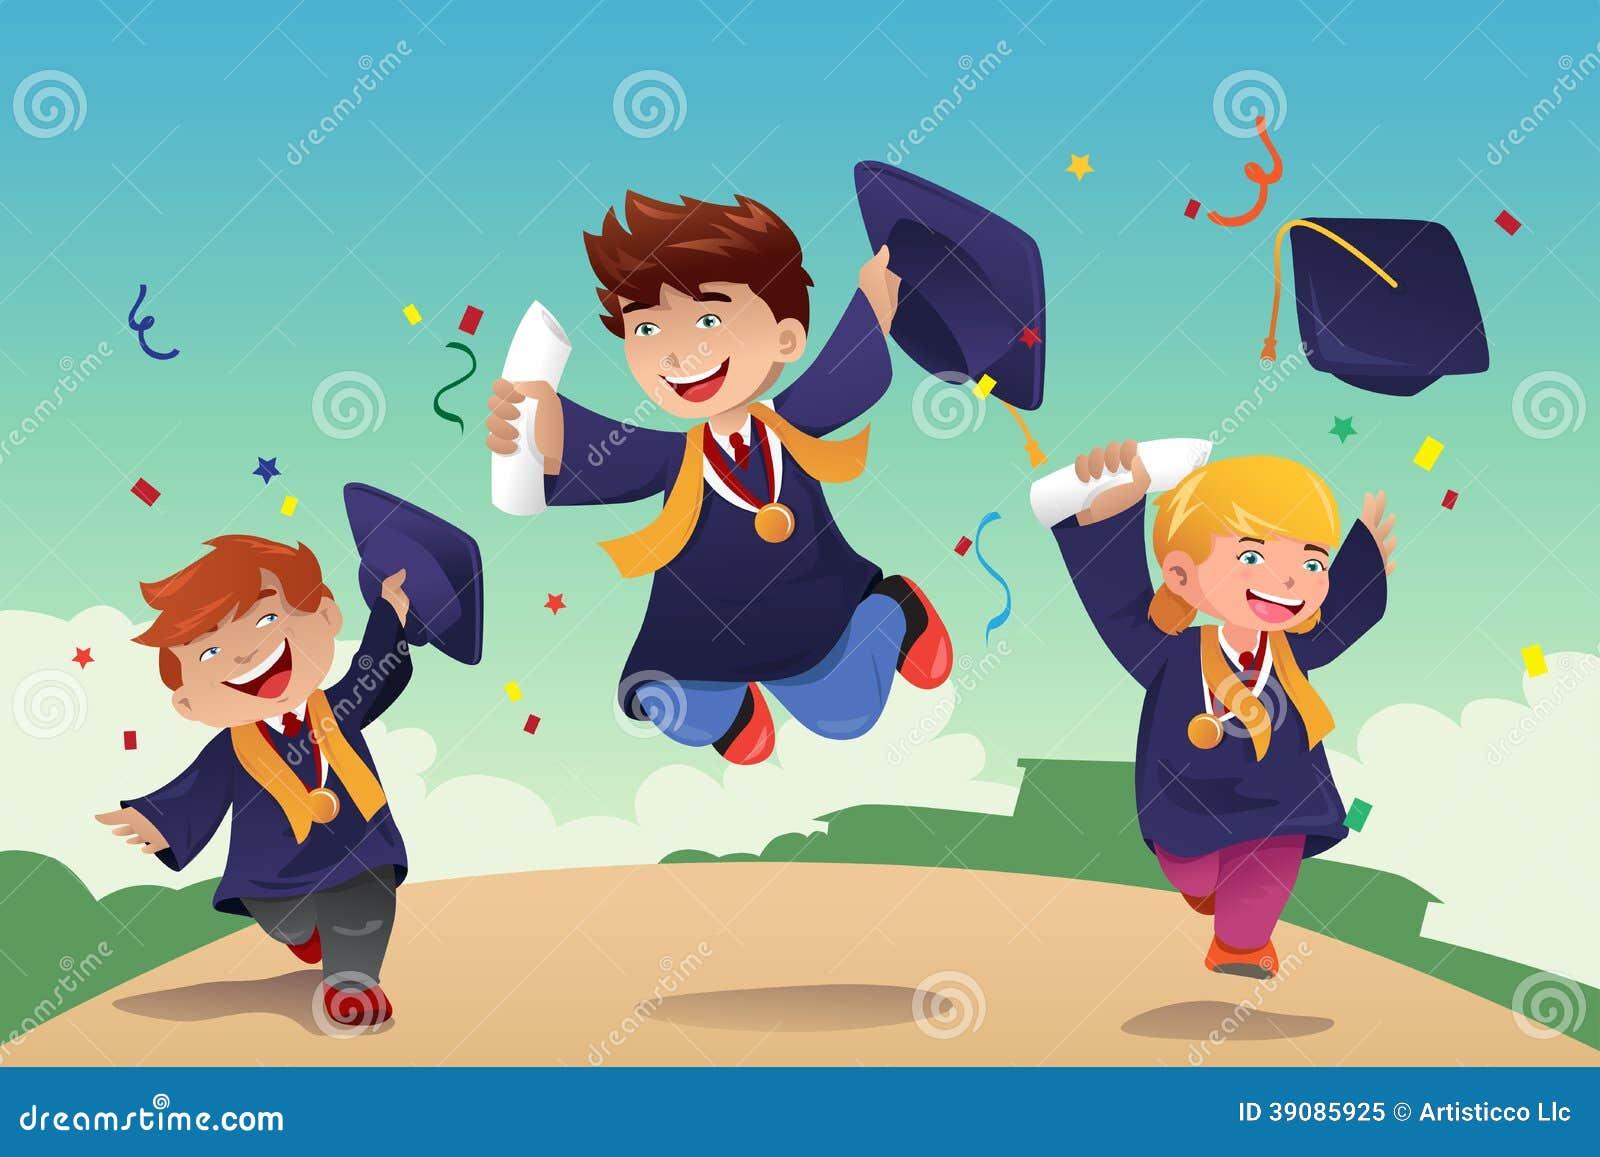 Students Celebrating Graduation Stock Vector - Image: 39085925 Happy High School Student Clipart